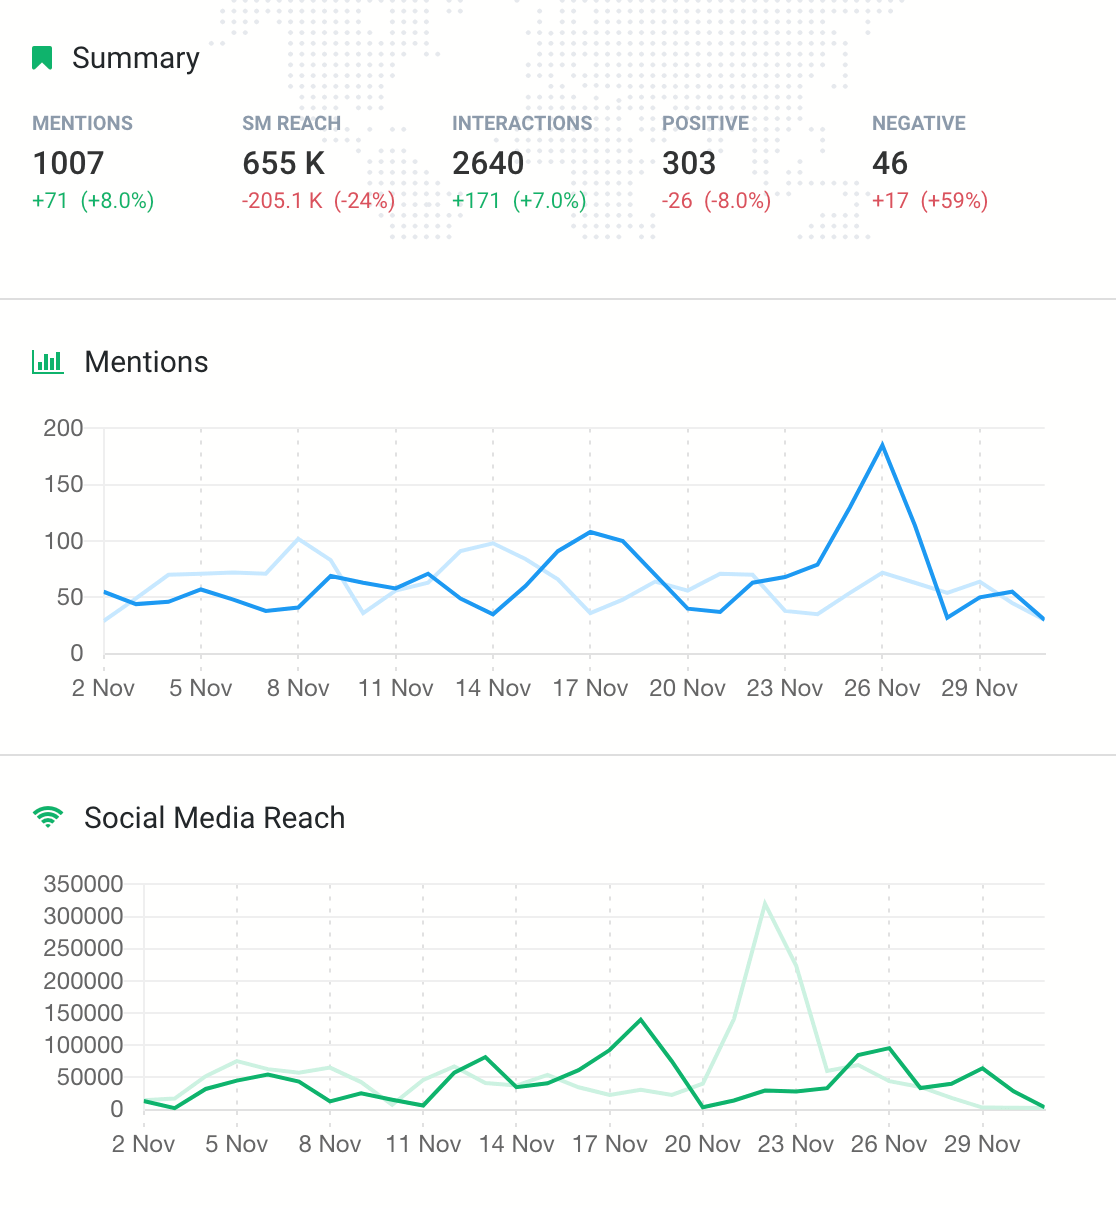 print screen showing metrics important for brand awareness